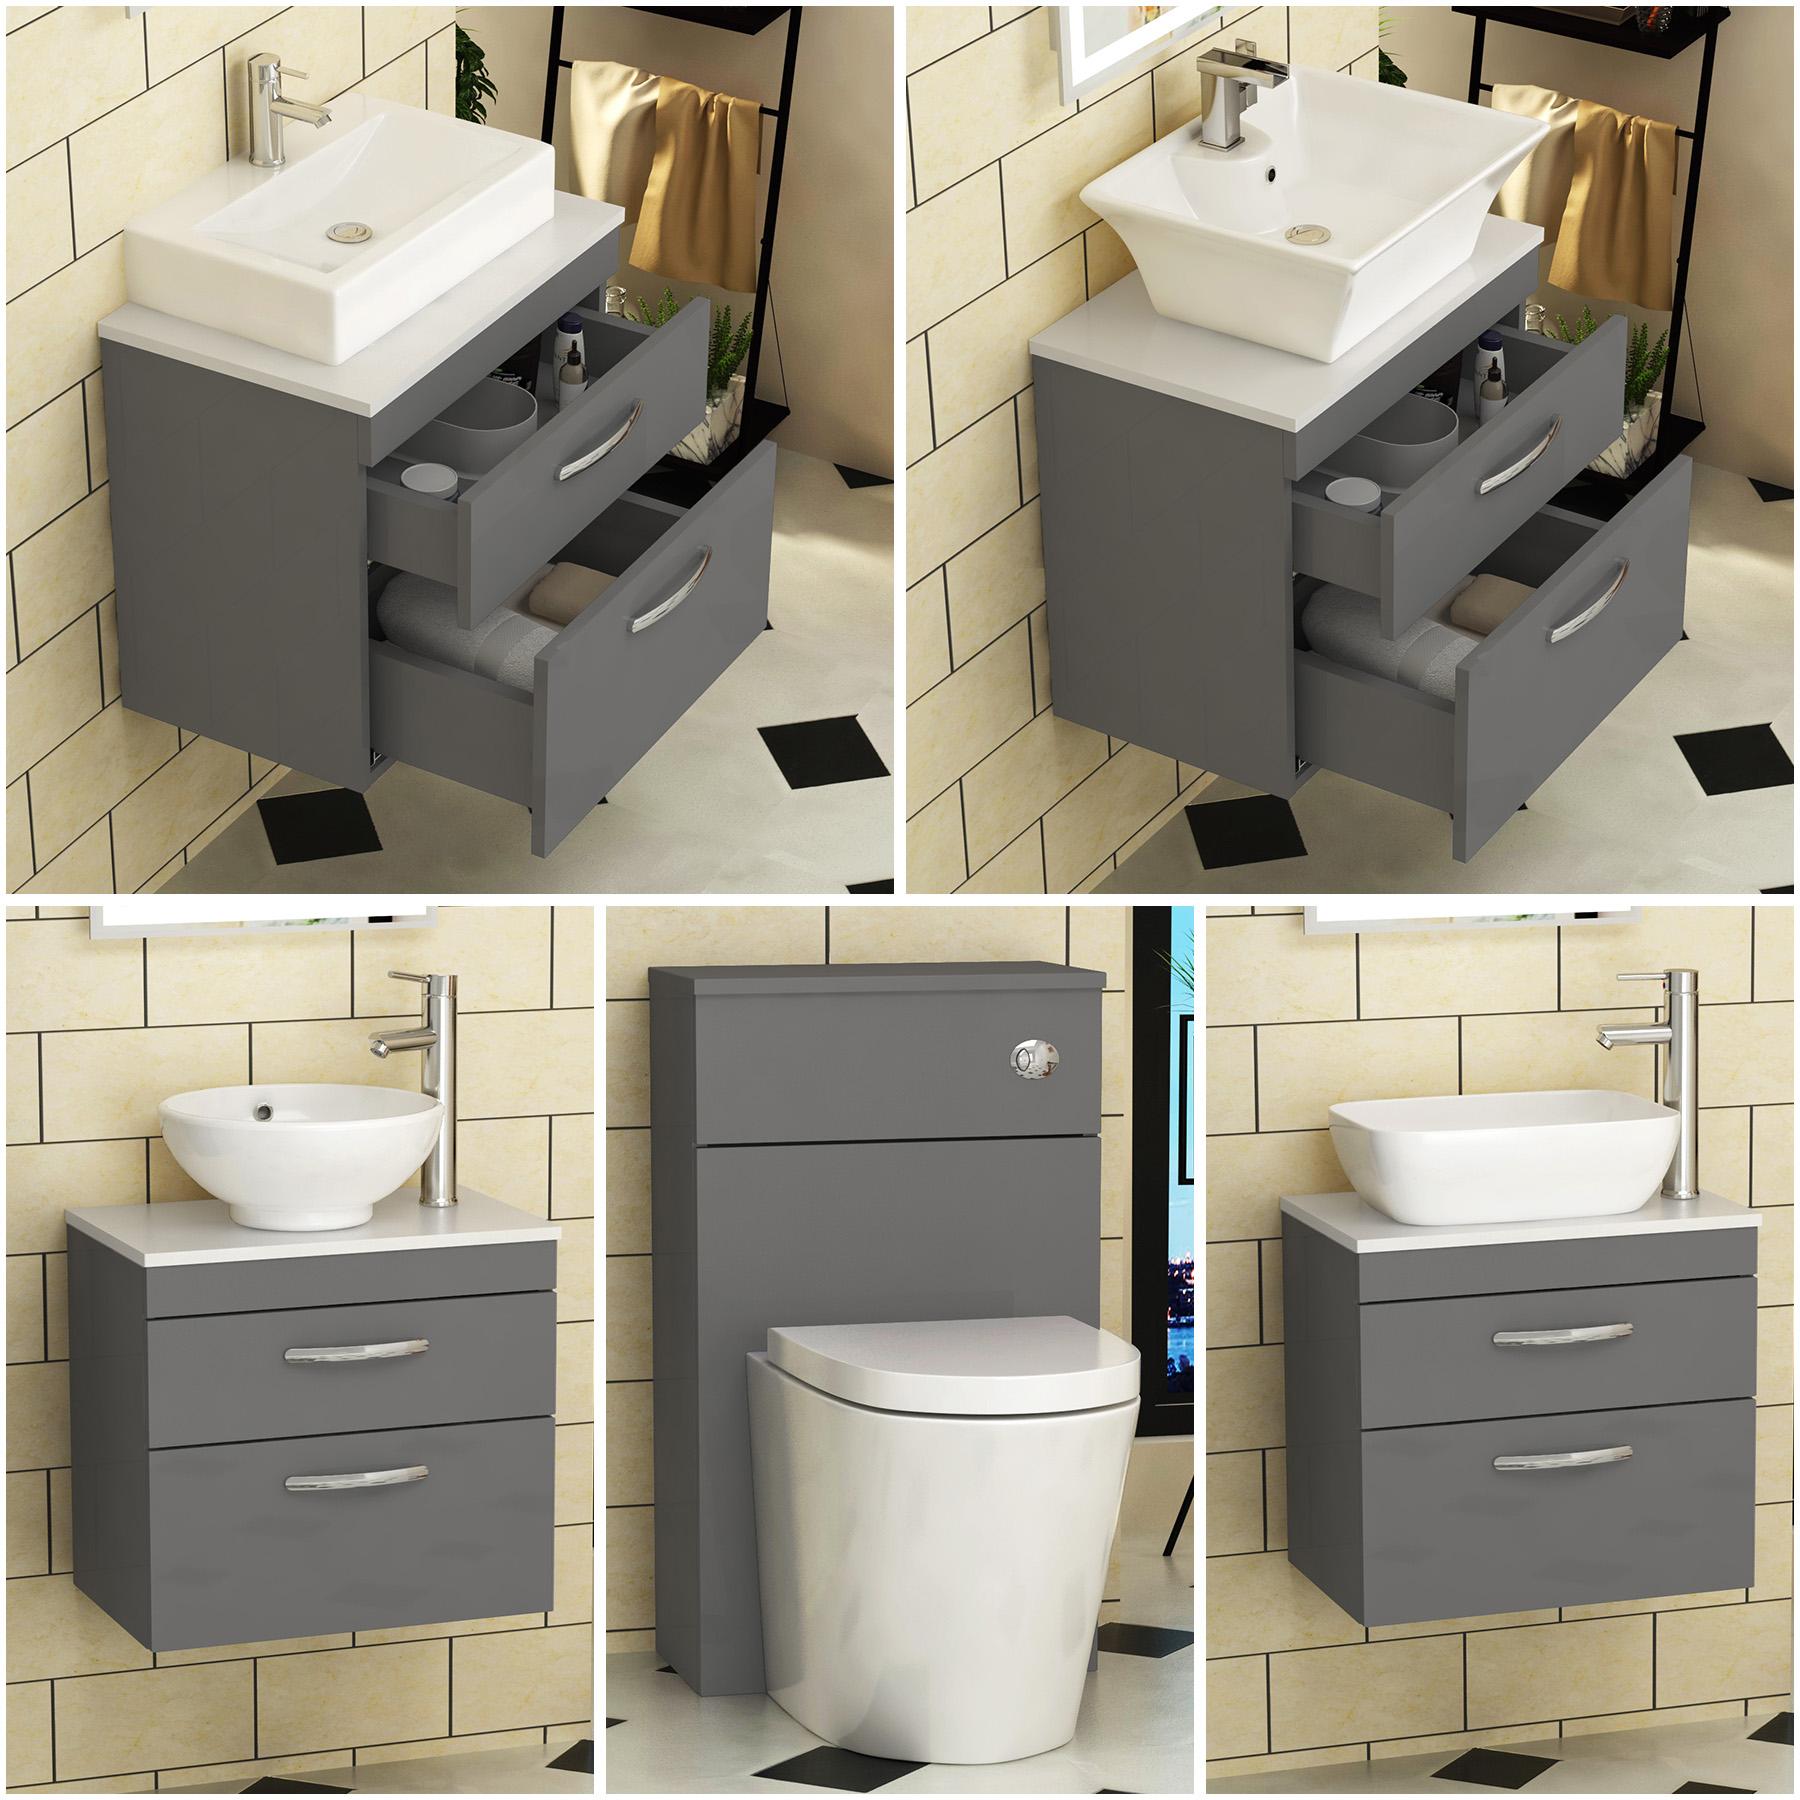 Bathroom Vanity Unit Countertop Basin Sink Grey Elm Cabinet Storage and WC Pan